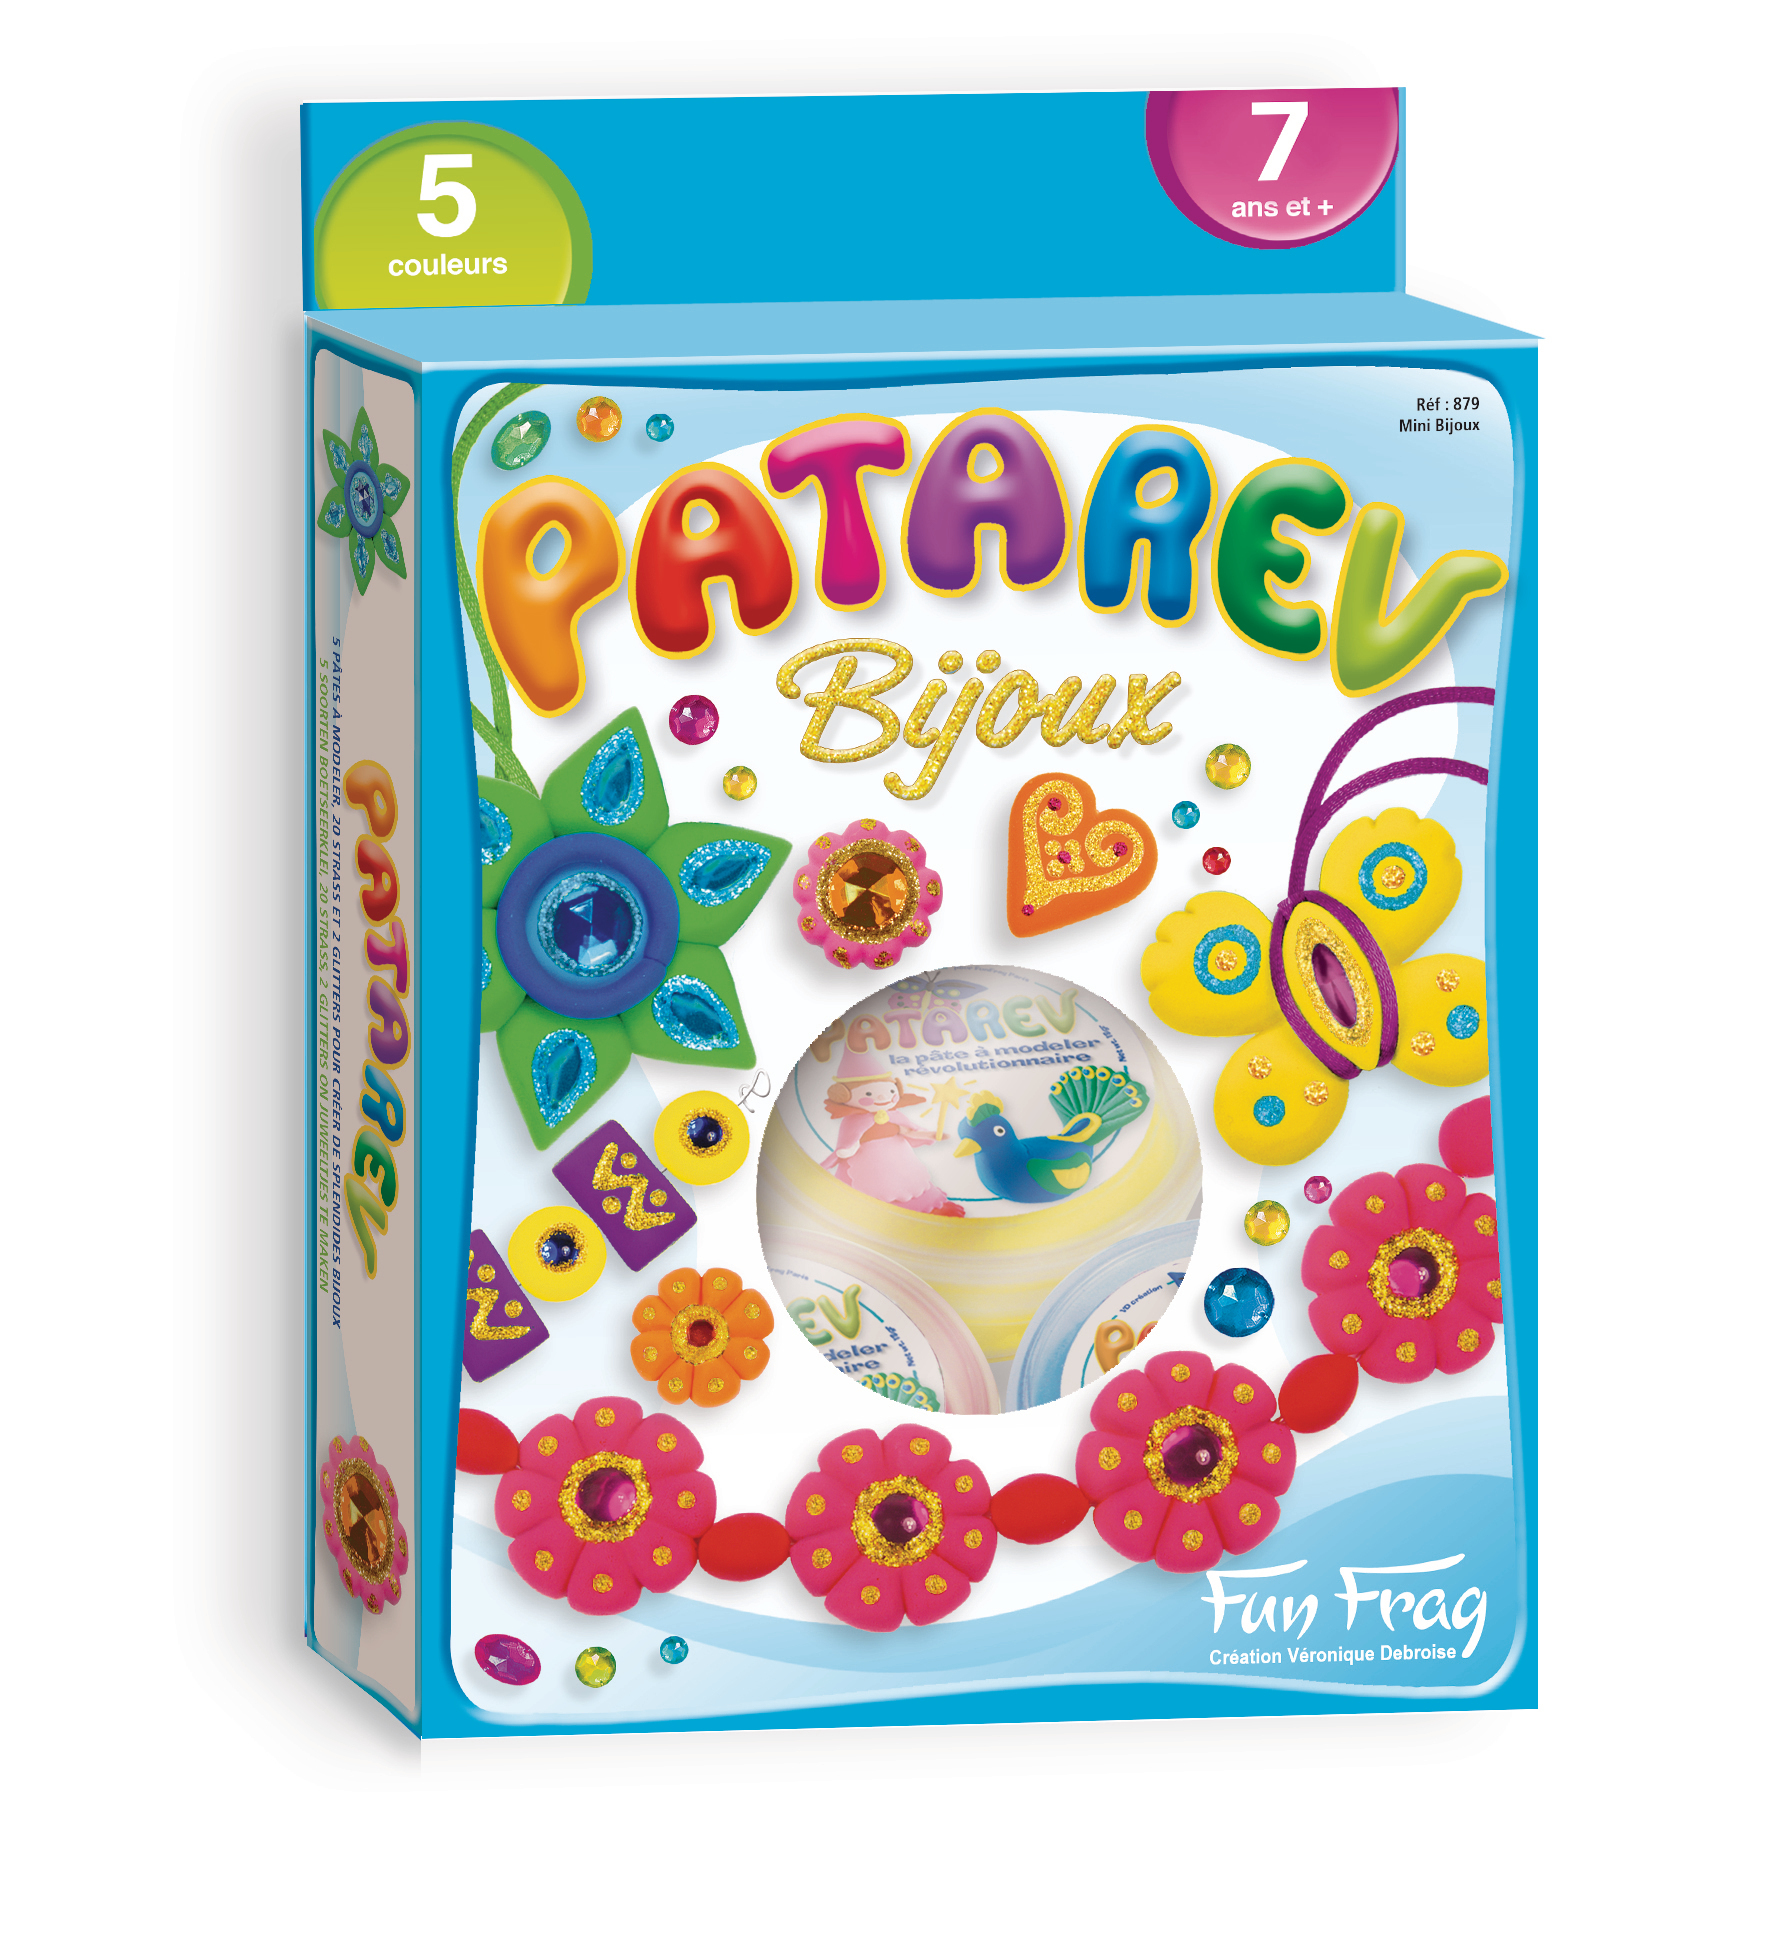 Pack Thématique Patarev - Bijoux